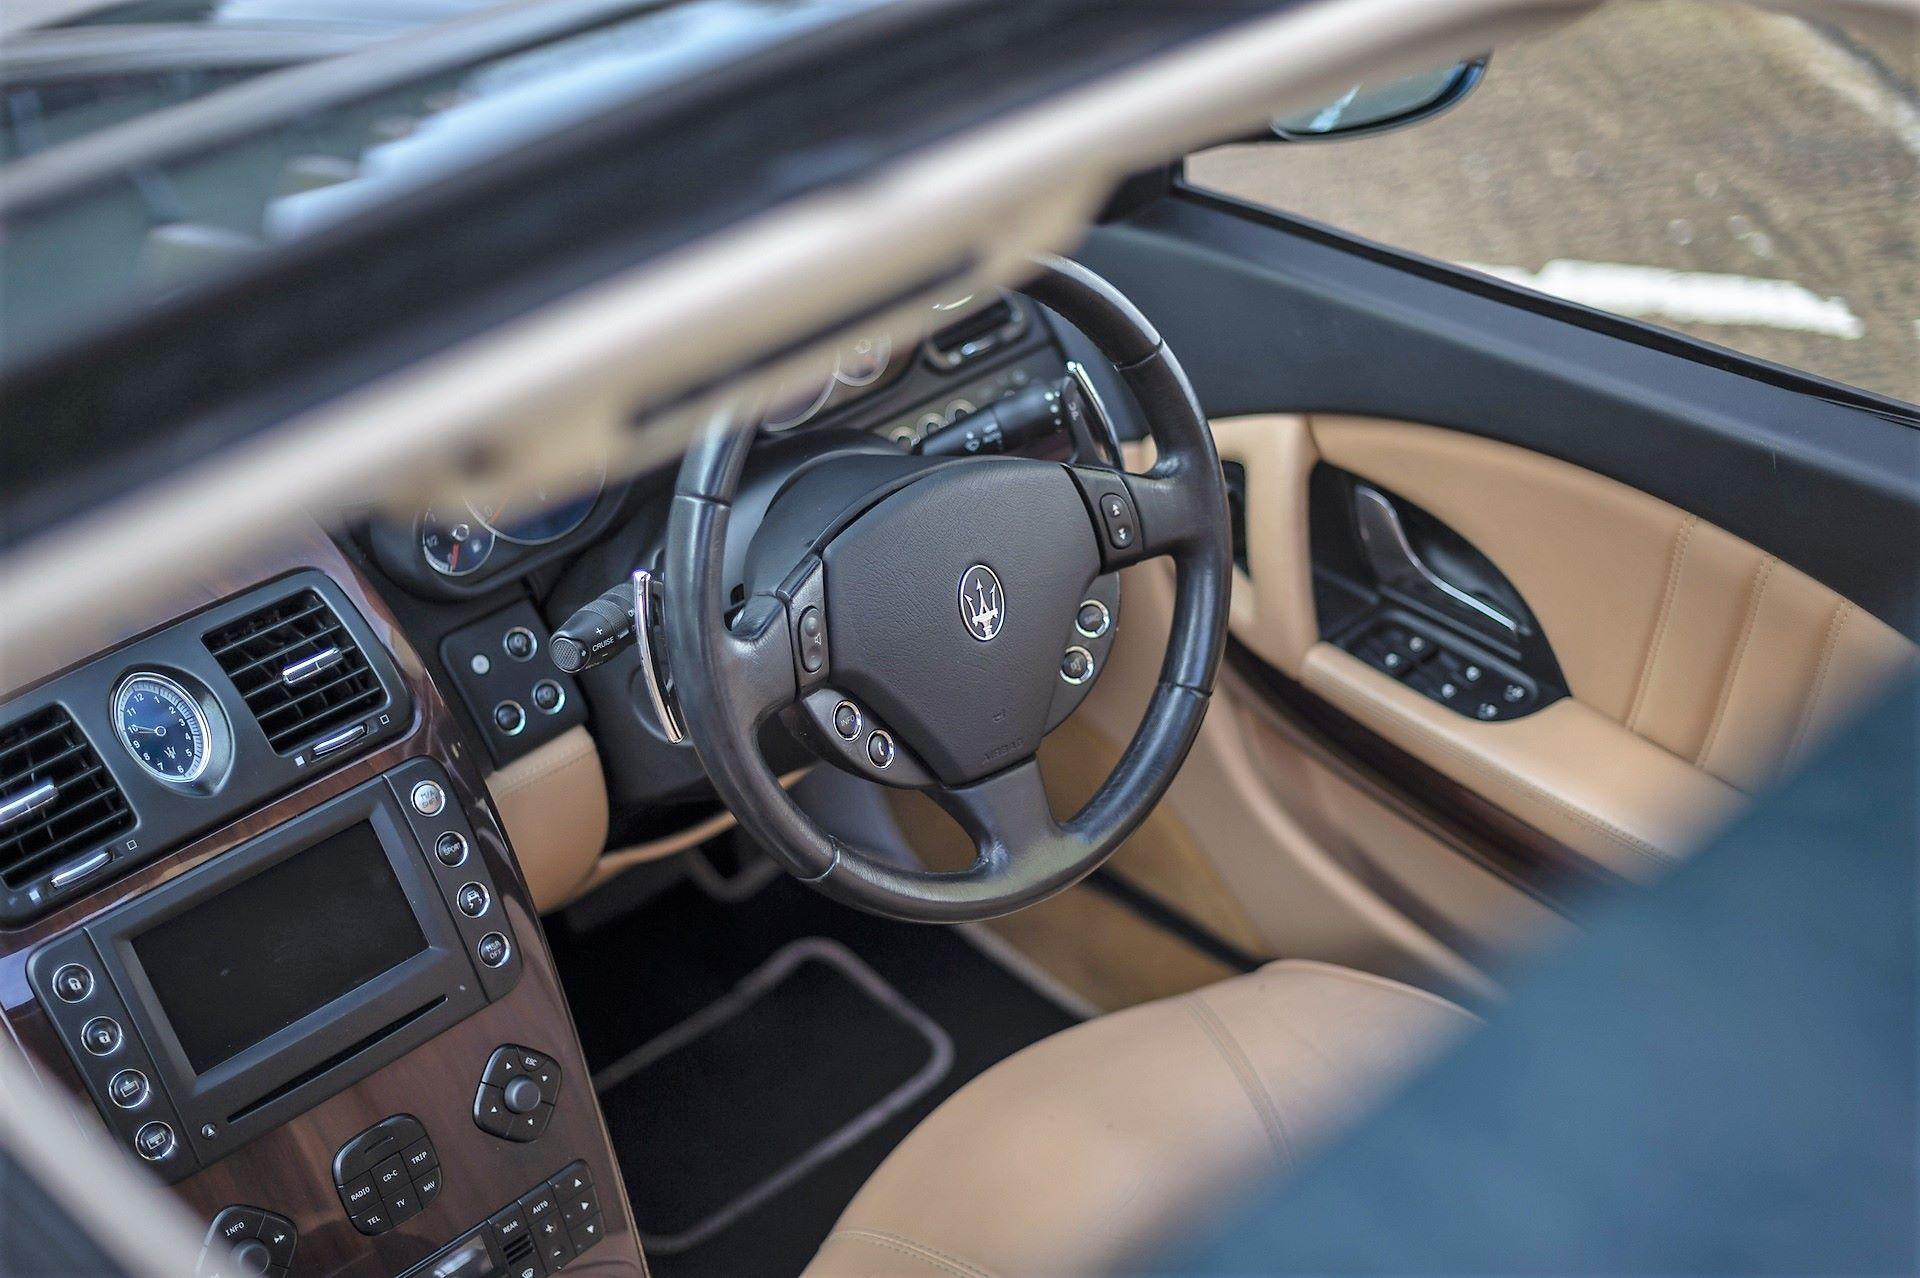 Elton-John-Maserati-Quattroporte-1